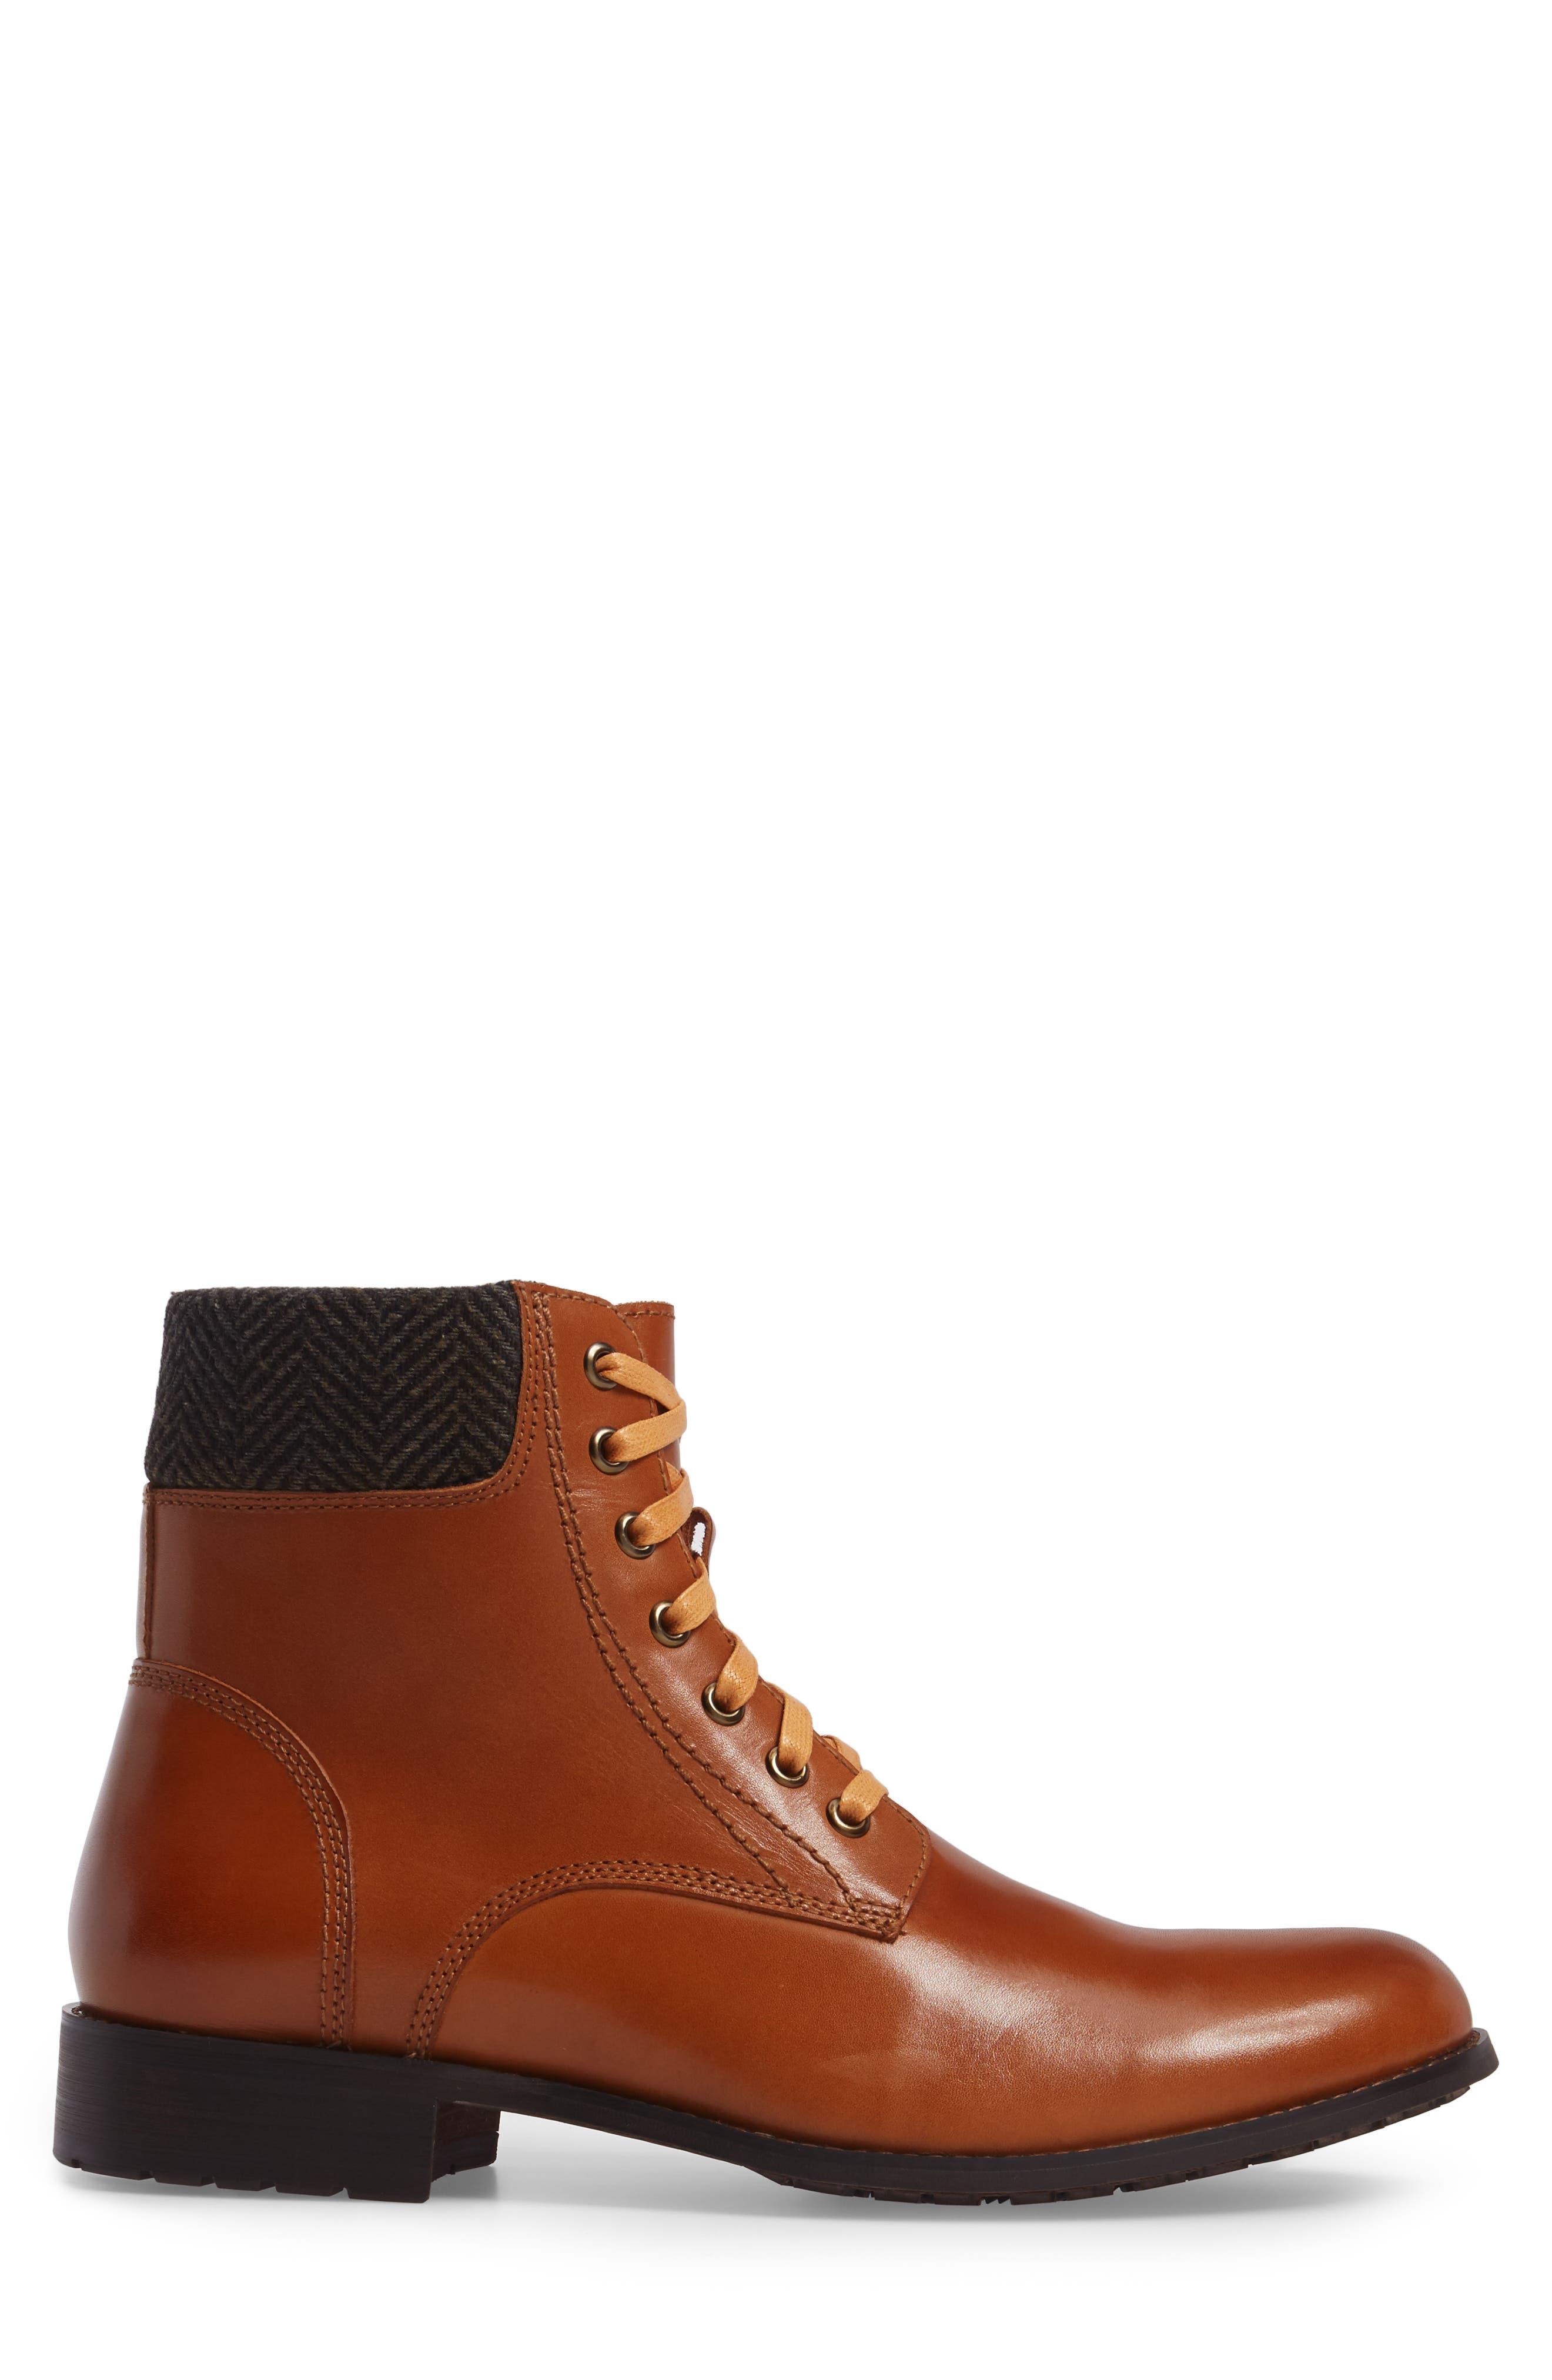 Saar Plain Toe Boot,                             Alternate thumbnail 3, color,                             Cognac Leather